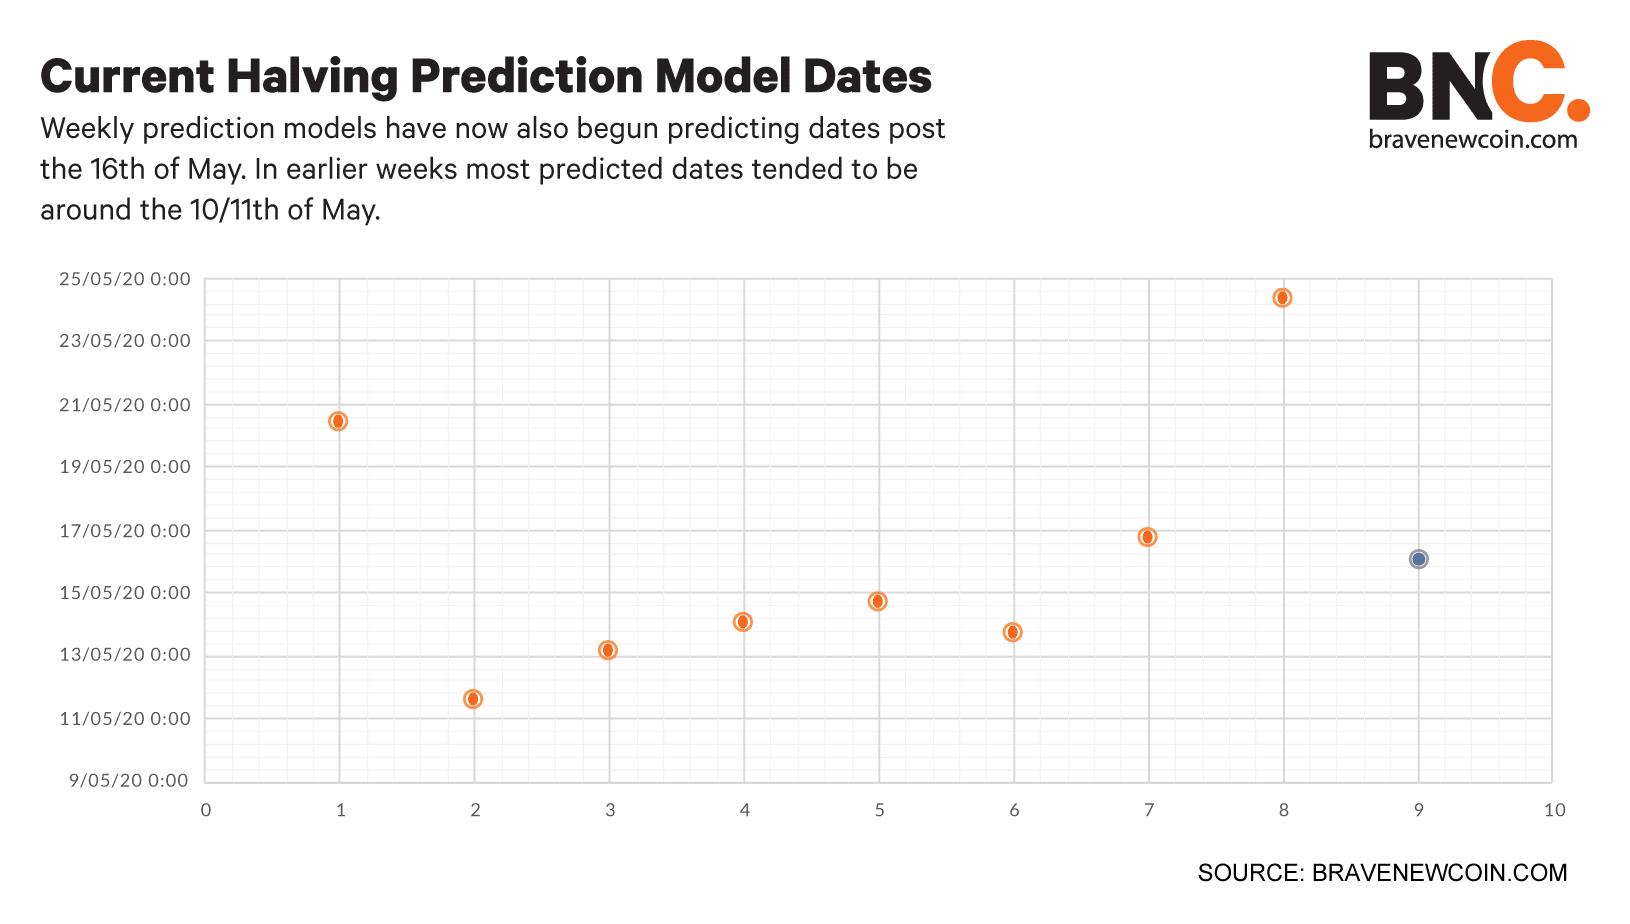 Current-halving-prediction-model-dates (4)